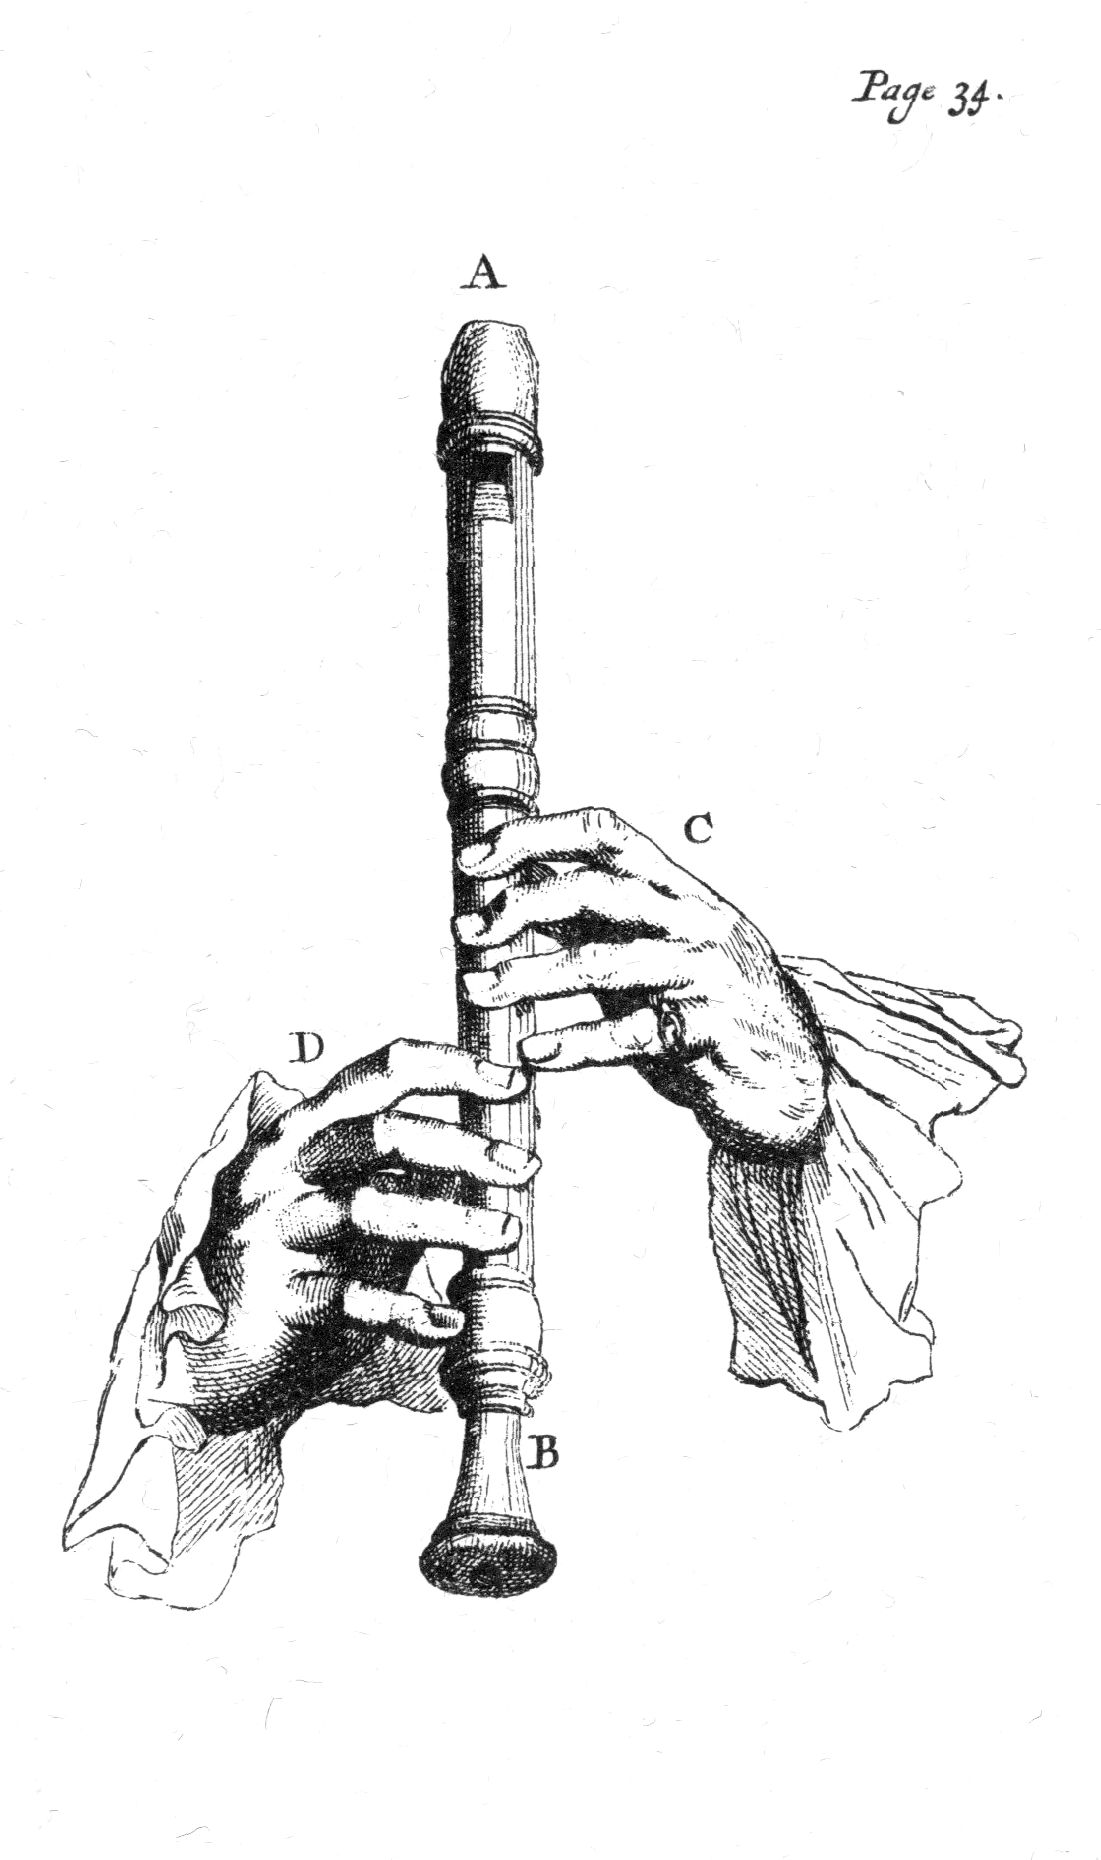 Hotteterre_flute-a-bec